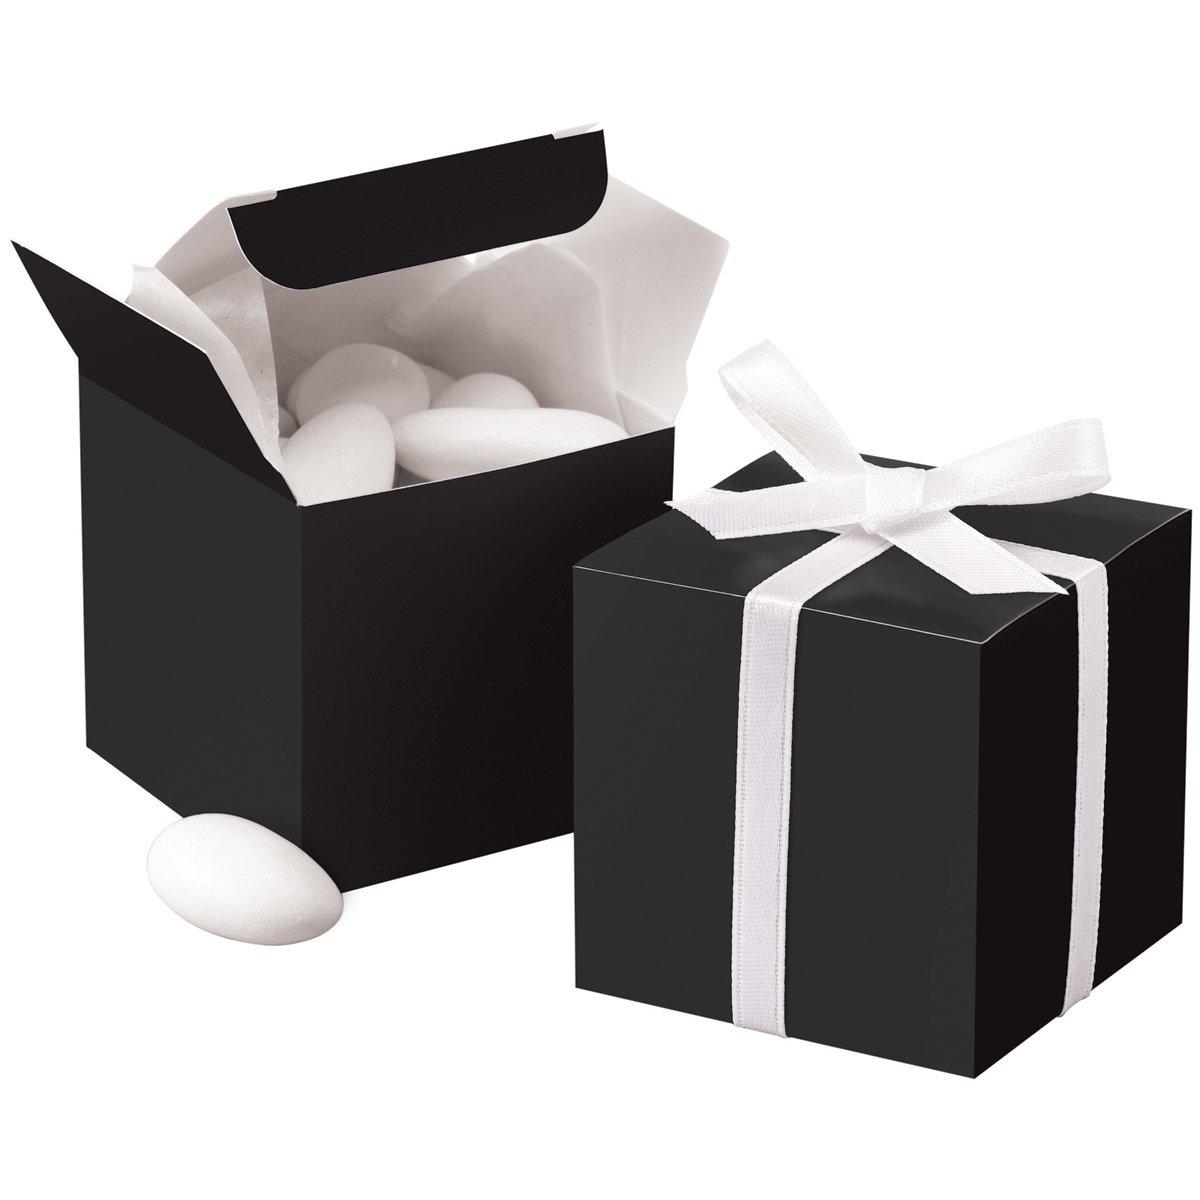 Wilton 1006-0638 Black Square Favor Box Kit, 100 Count by Simplicity (Image #1)